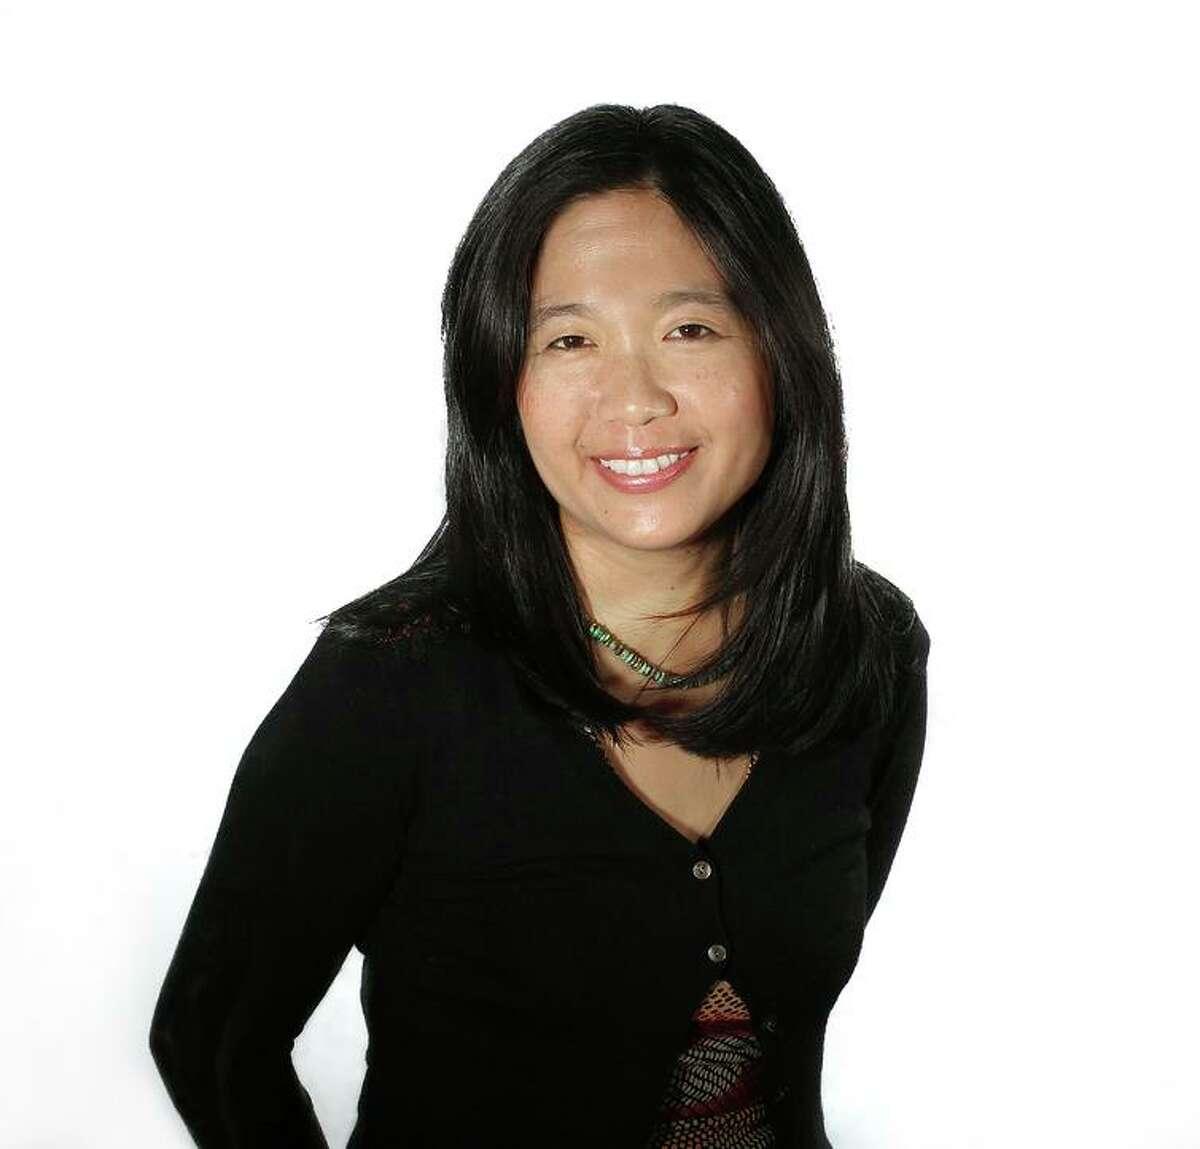 Datebook columnist Vanessa Hua in San Francisco, California on tuesday, may 3, 2016.